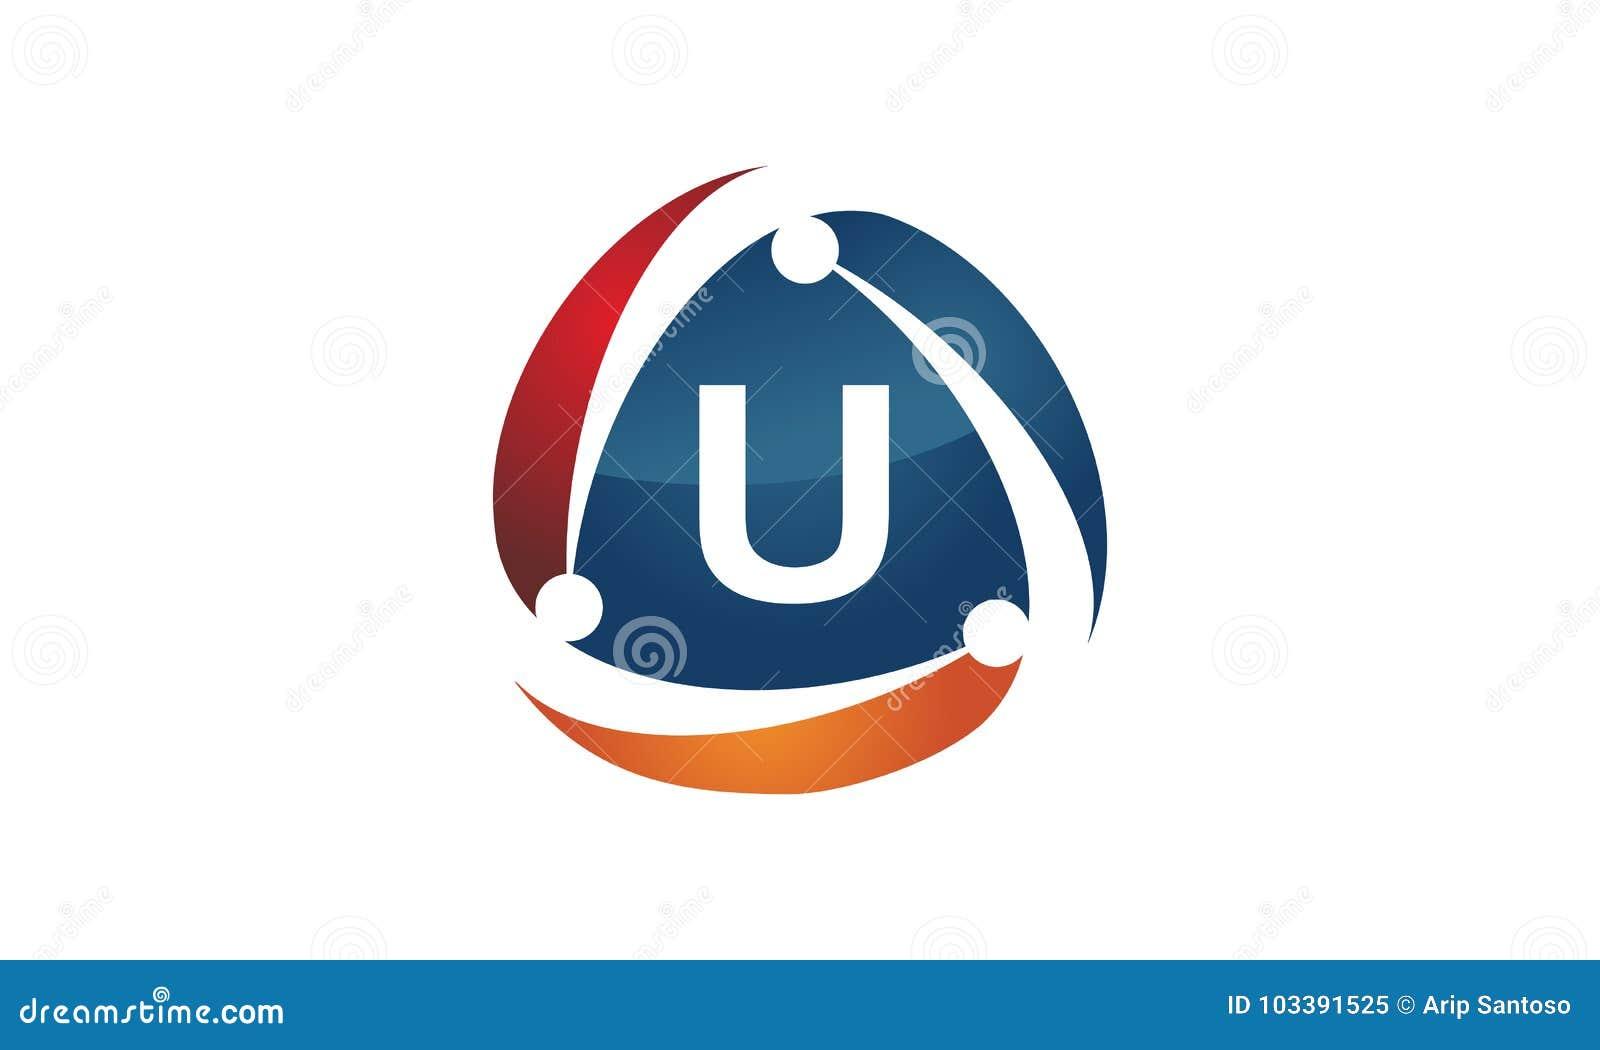 online marketing business distribution technology letter u stock